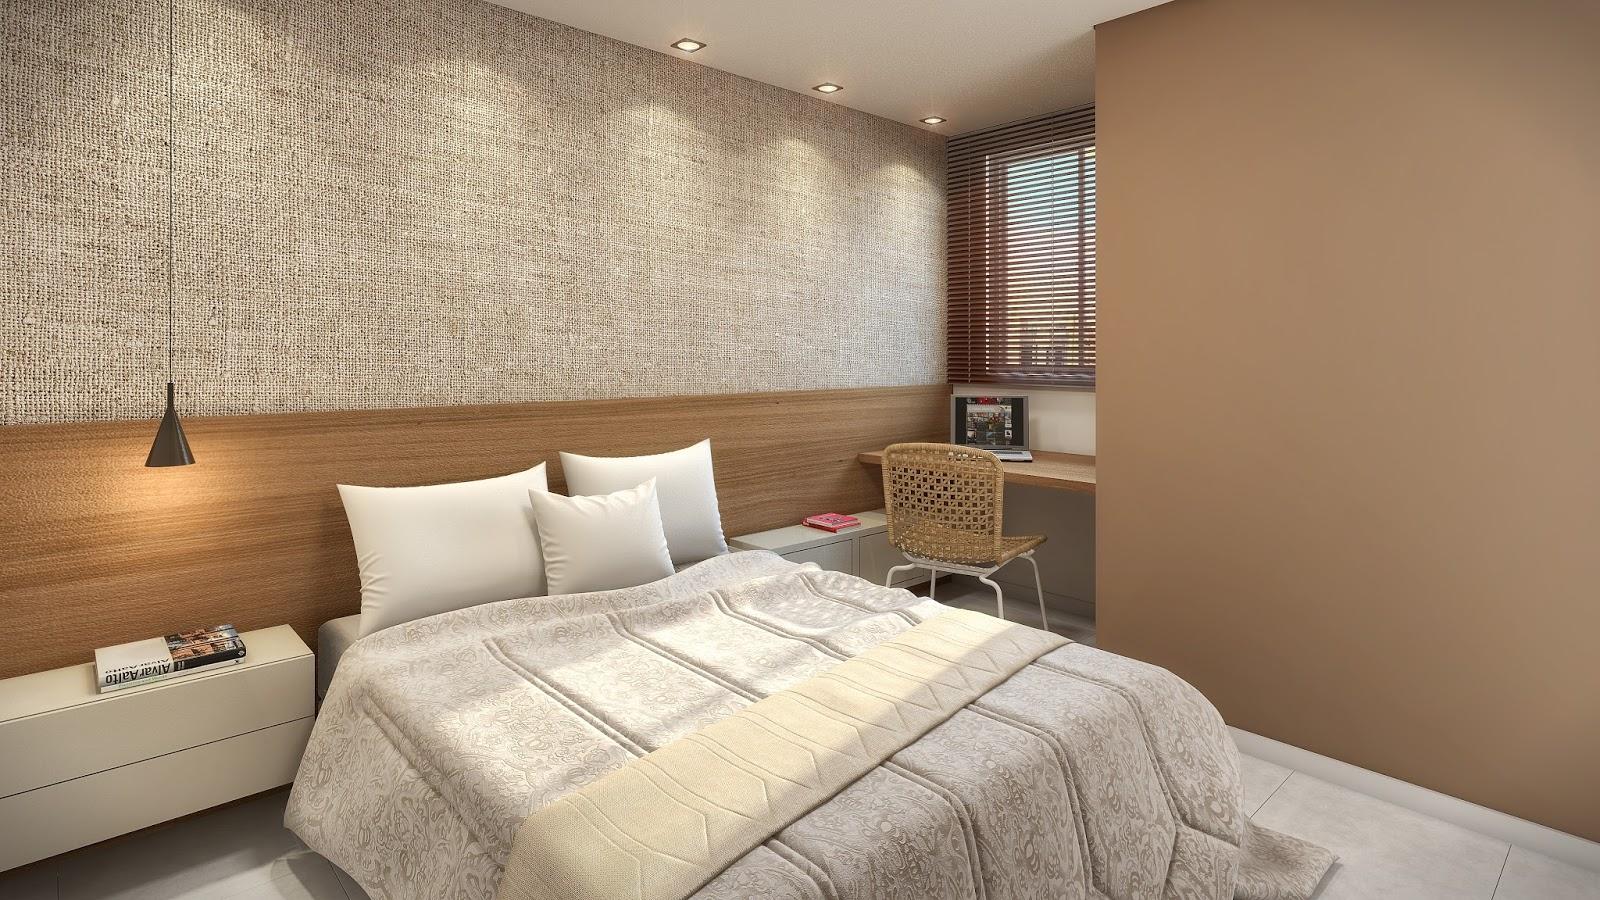 Construindo Minha Casa Clean Quartos Pequenos dos Sonhos de Todo Casal  5 D